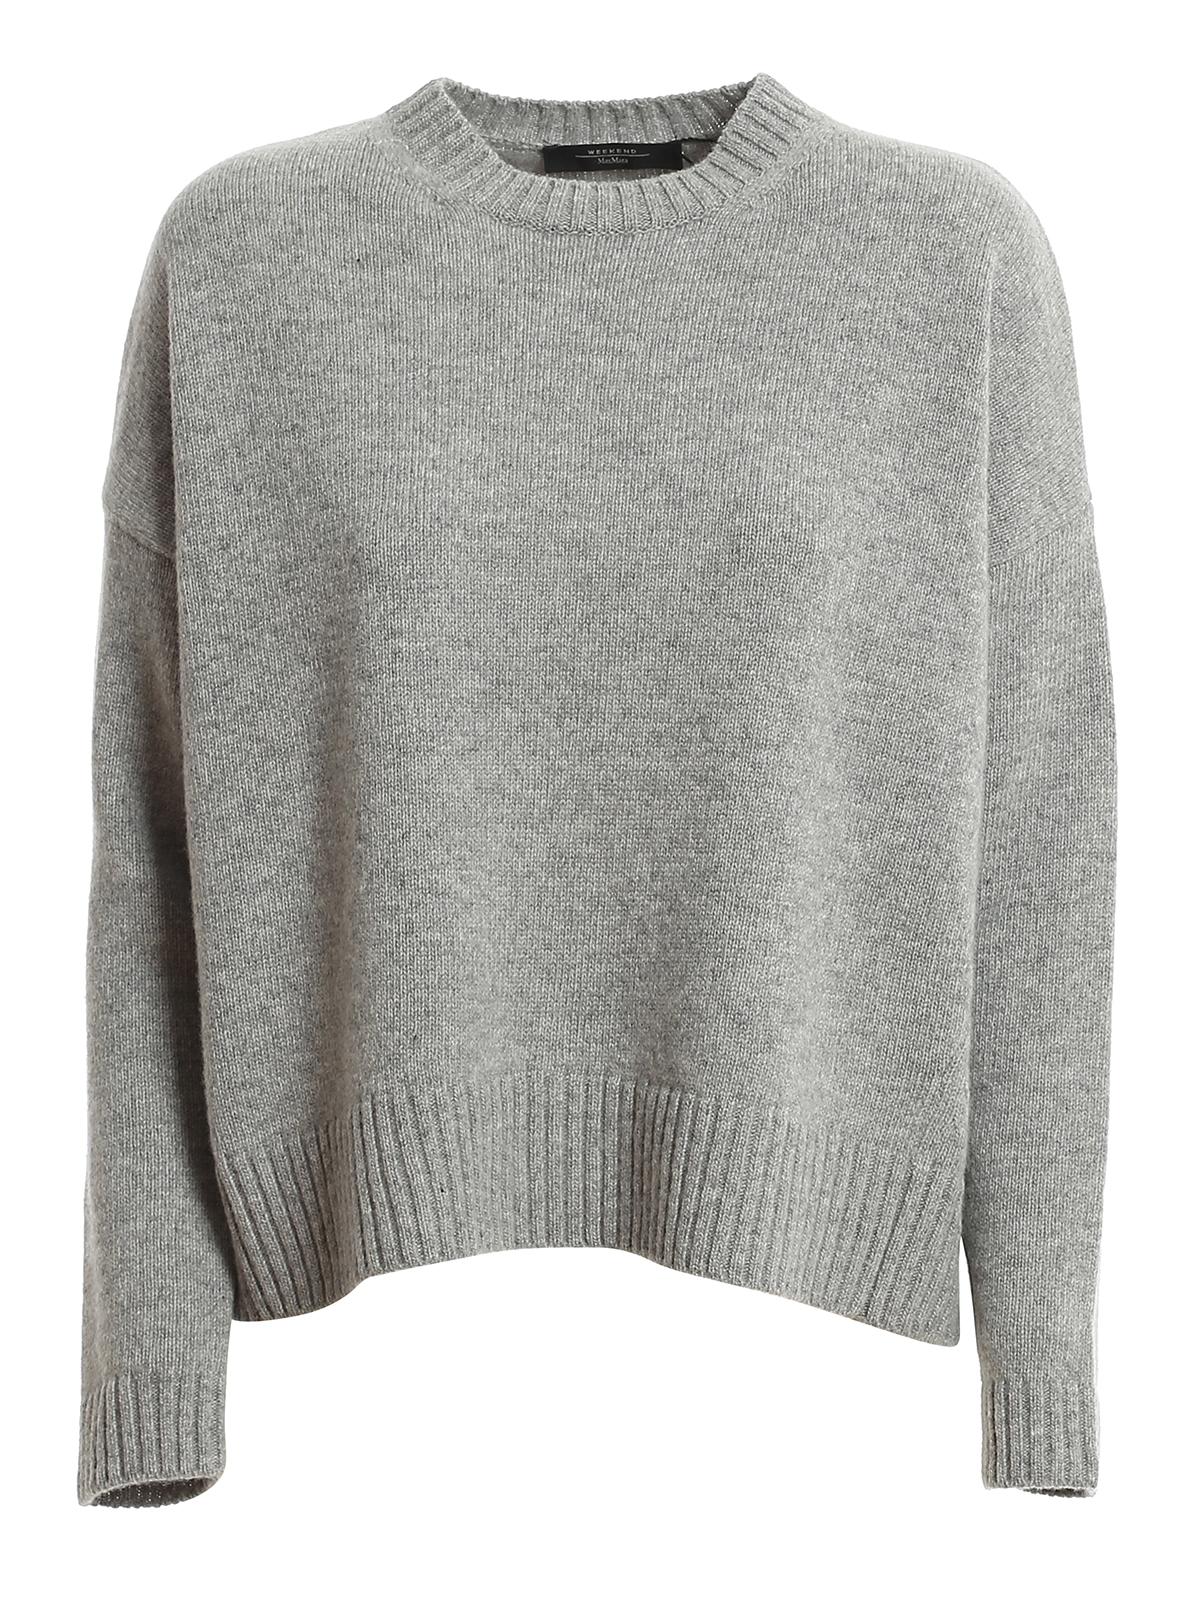 Weekend Max Mara Alpe Sweater In Grey